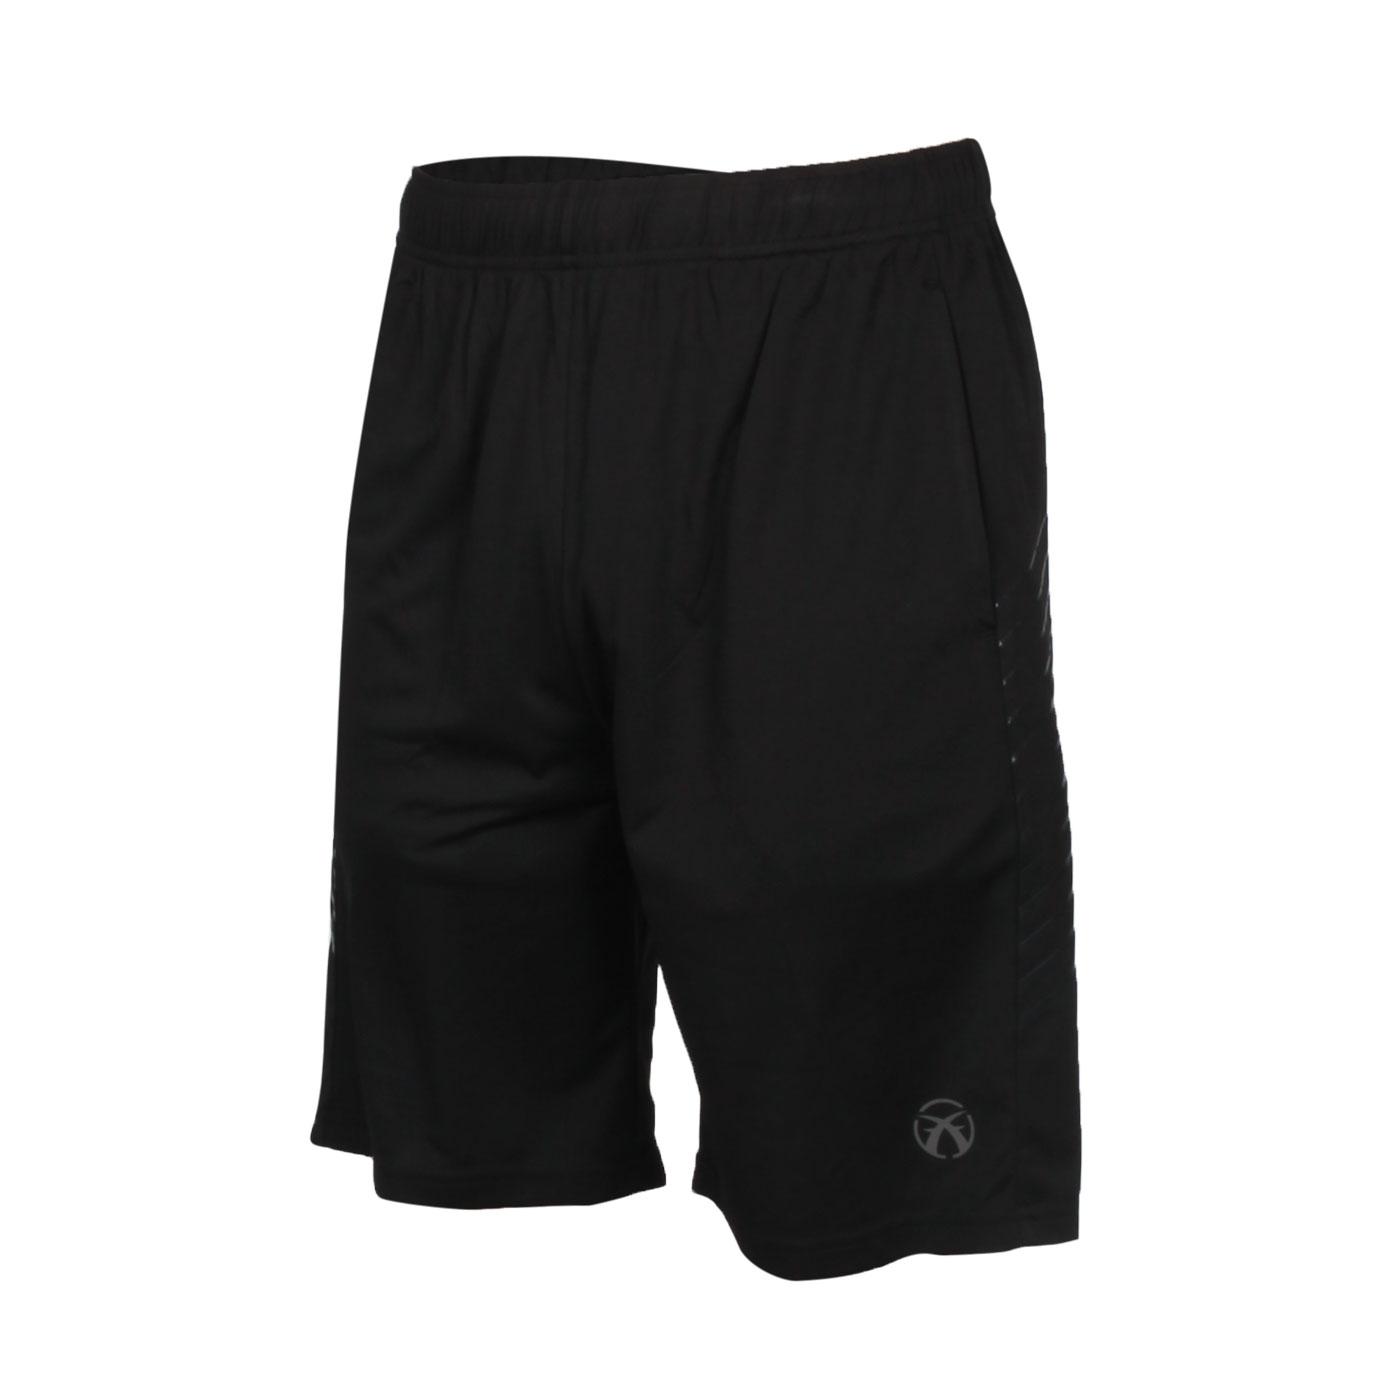 FIRESTAR 男款吸排訓練籃球褲 B0506-10 - 黑灰